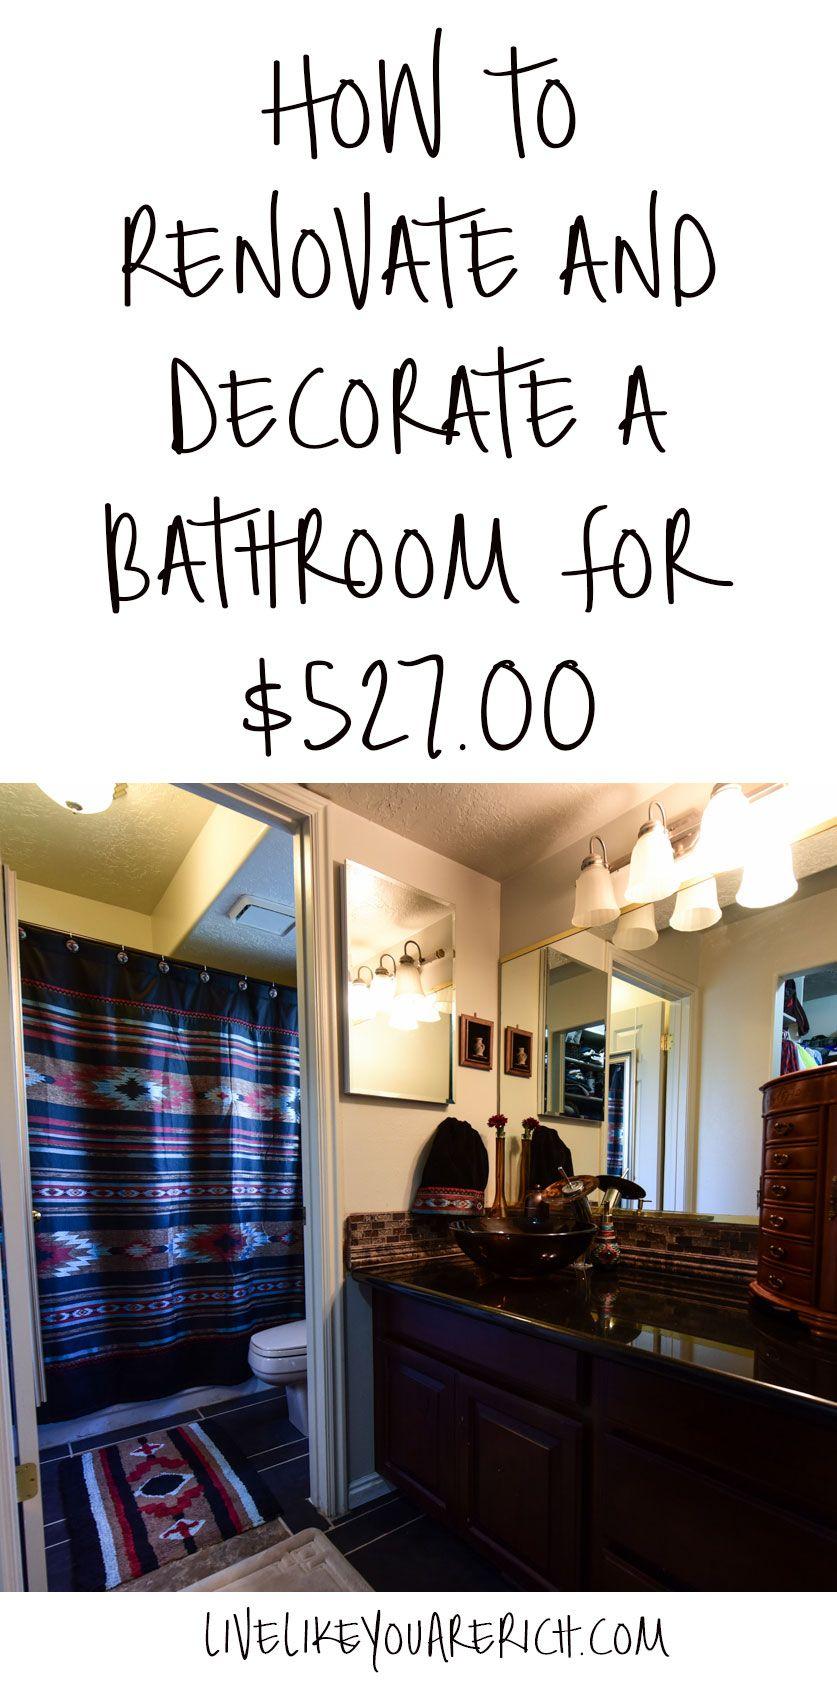 How To Save Money Renovating A Bathroom Budget Bathroom Remodel Renovation Home Remodeling